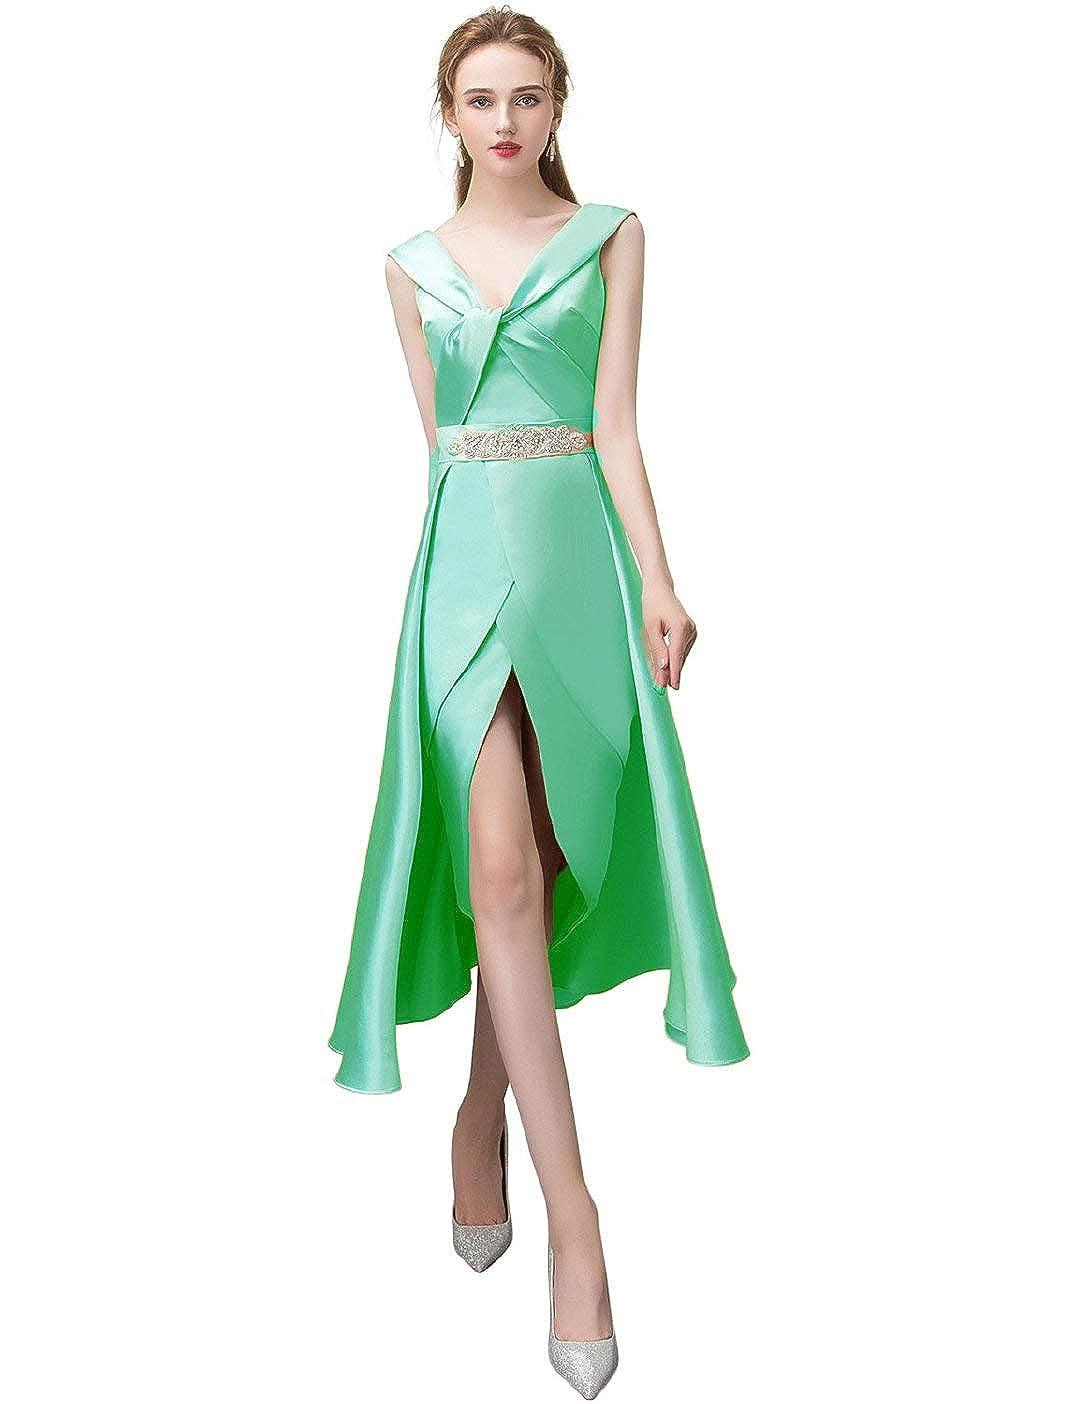 Mint Green Anshirlisa Women's Sleeveless Credver Pleat HighLow Satin Gown Dress